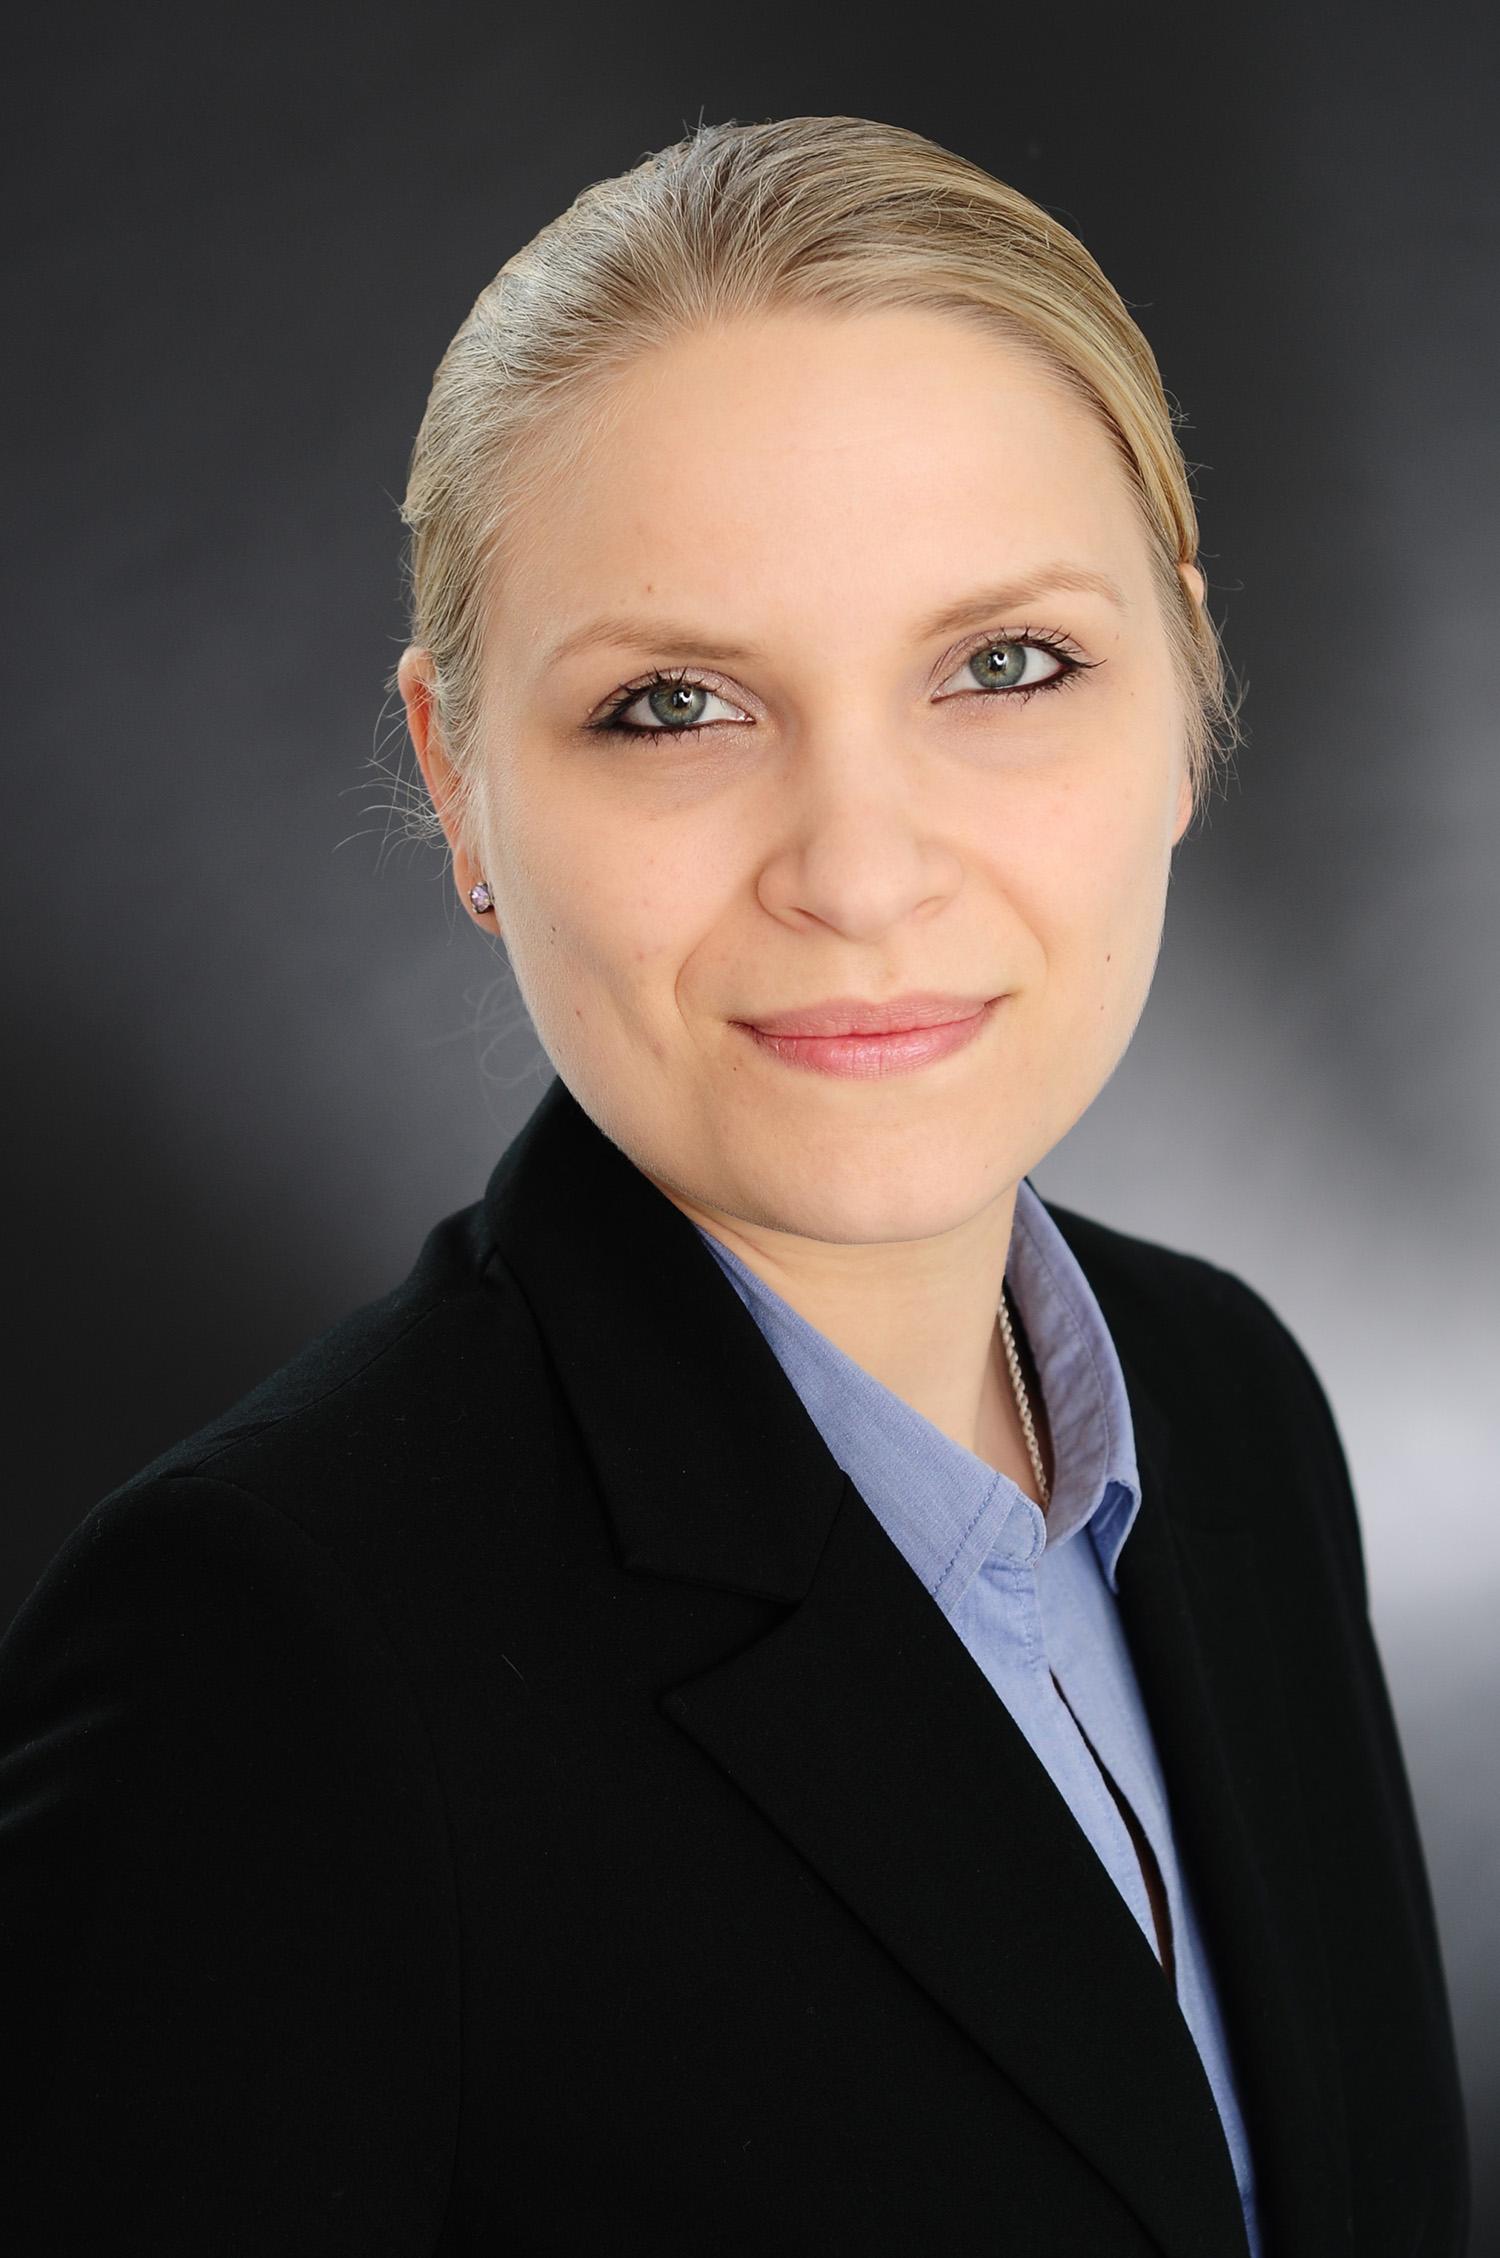 Simone Kruse r